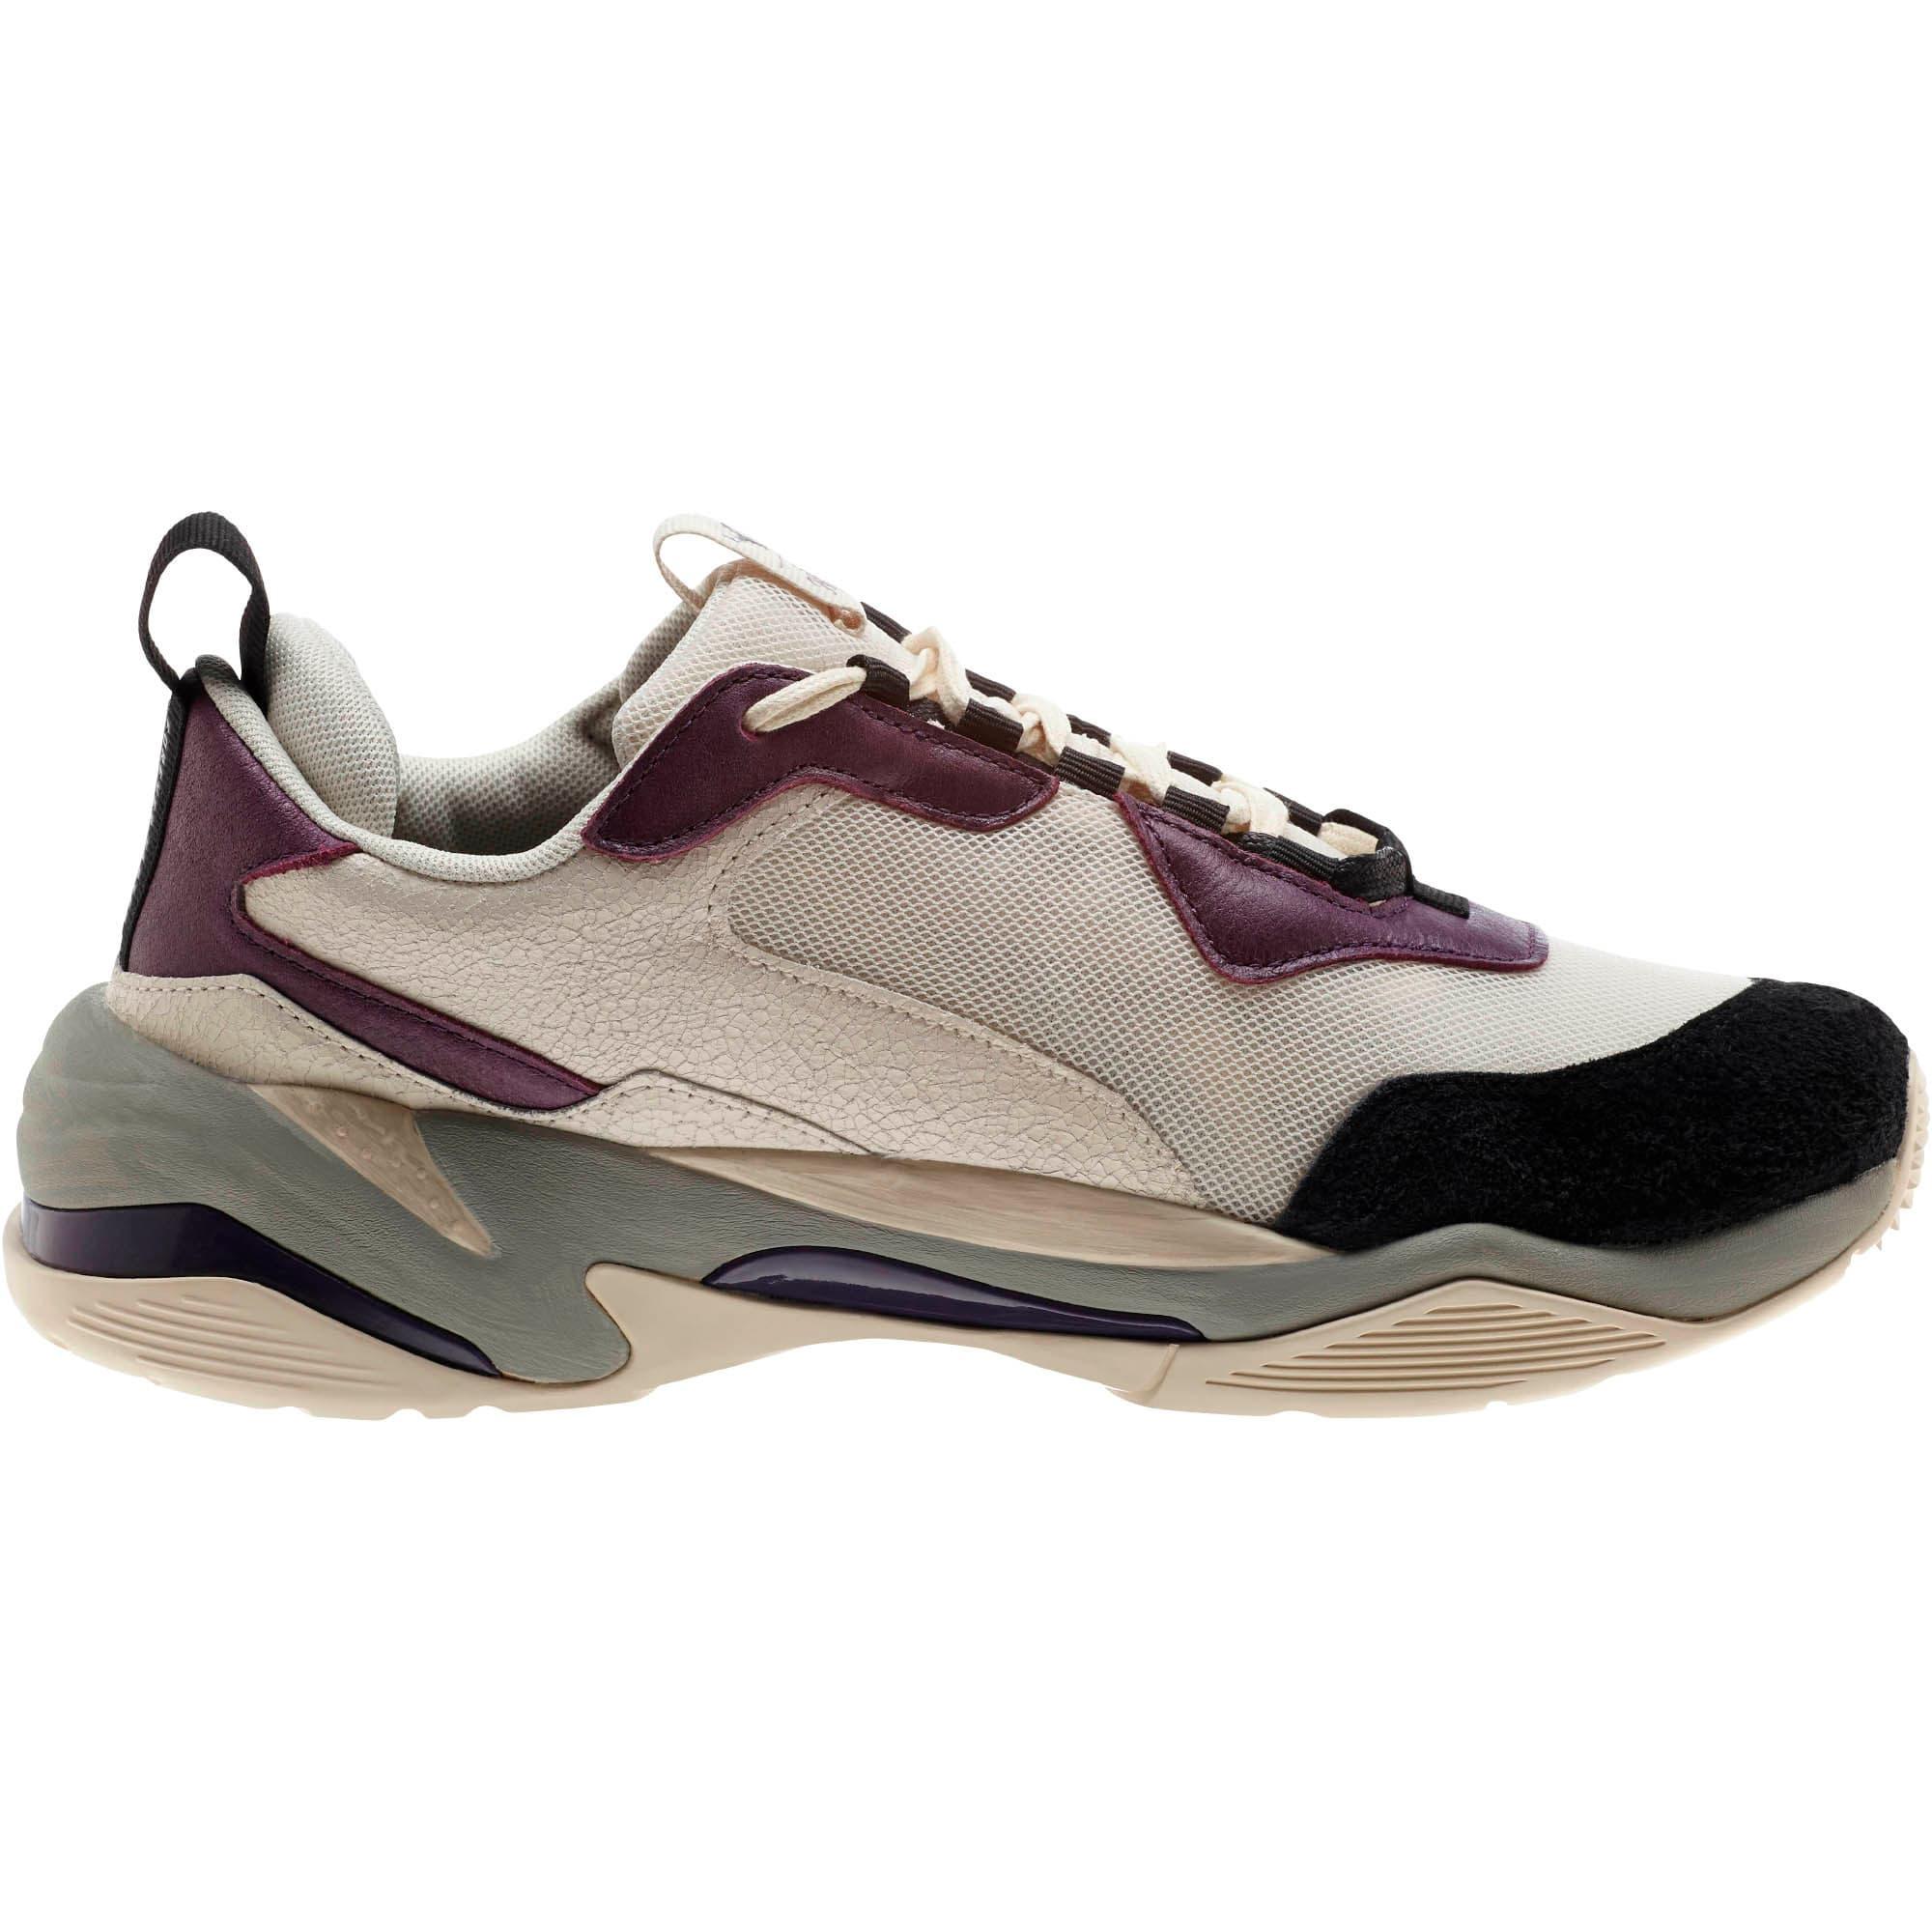 Thumbnail 4 of Thunder x PRPS Sneakers, Birch- Black-Indigo, medium